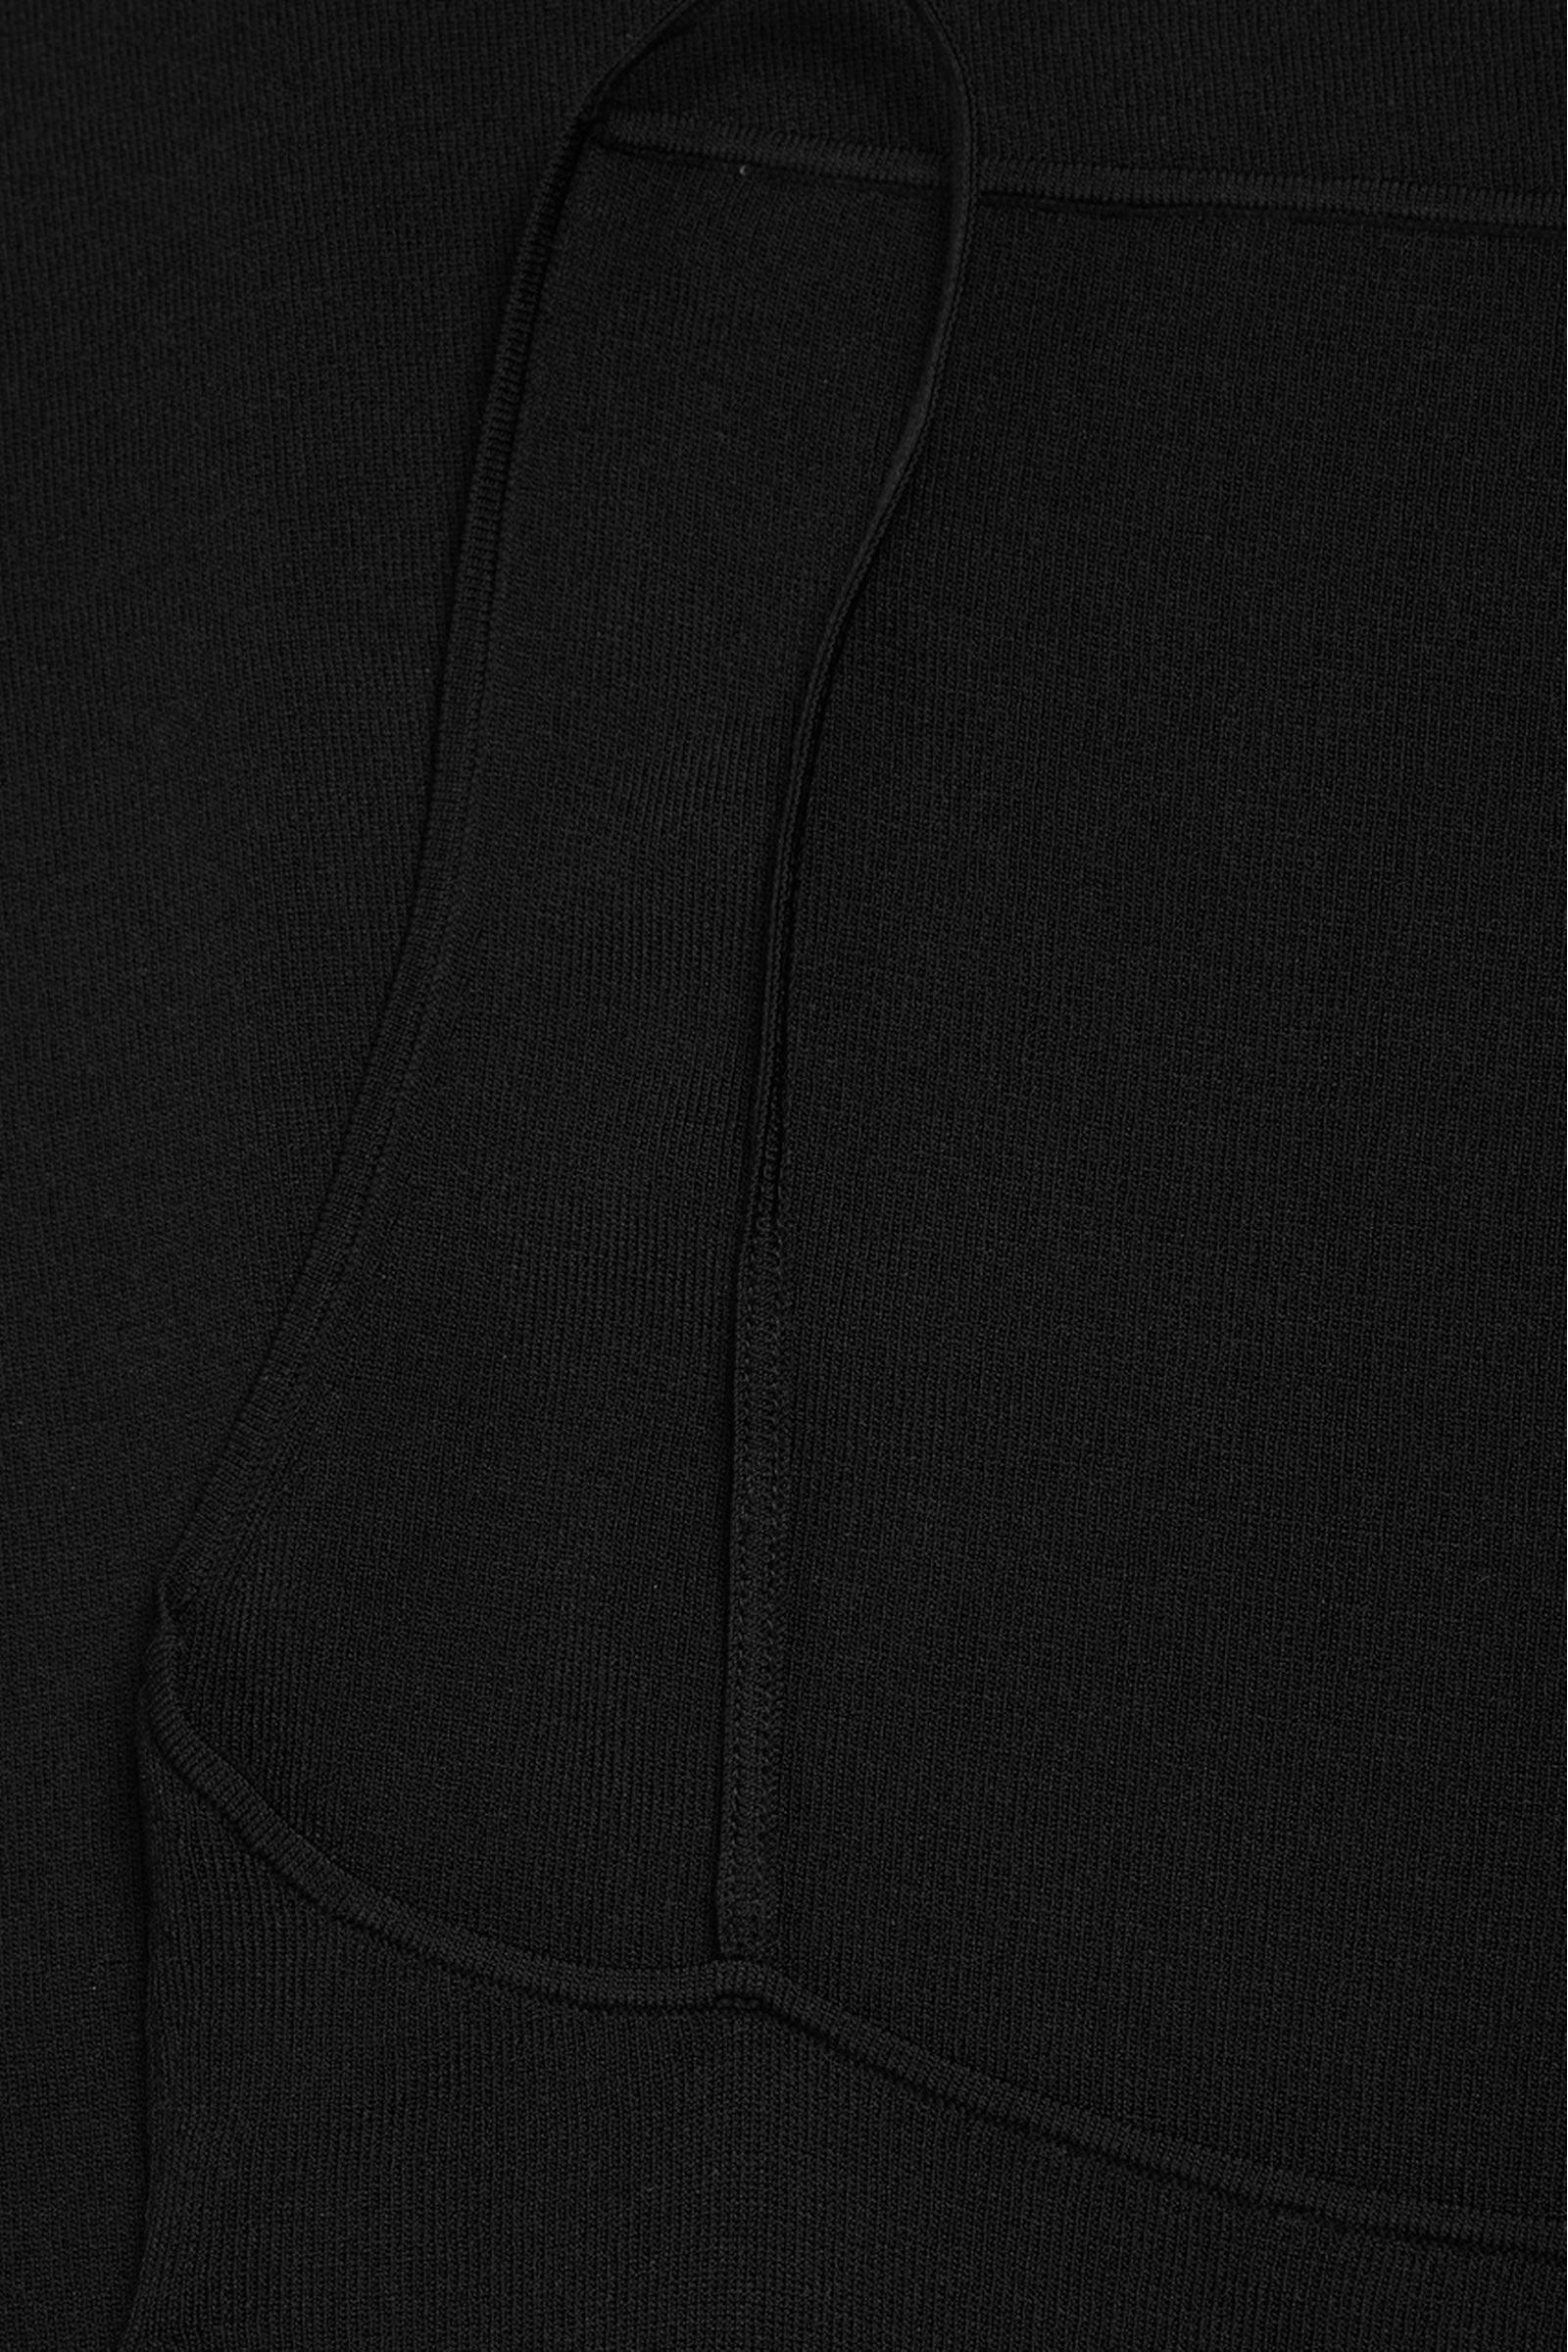 COS 백리스 니티드 슬립 드레스의 블랙컬러 Detail입니다.